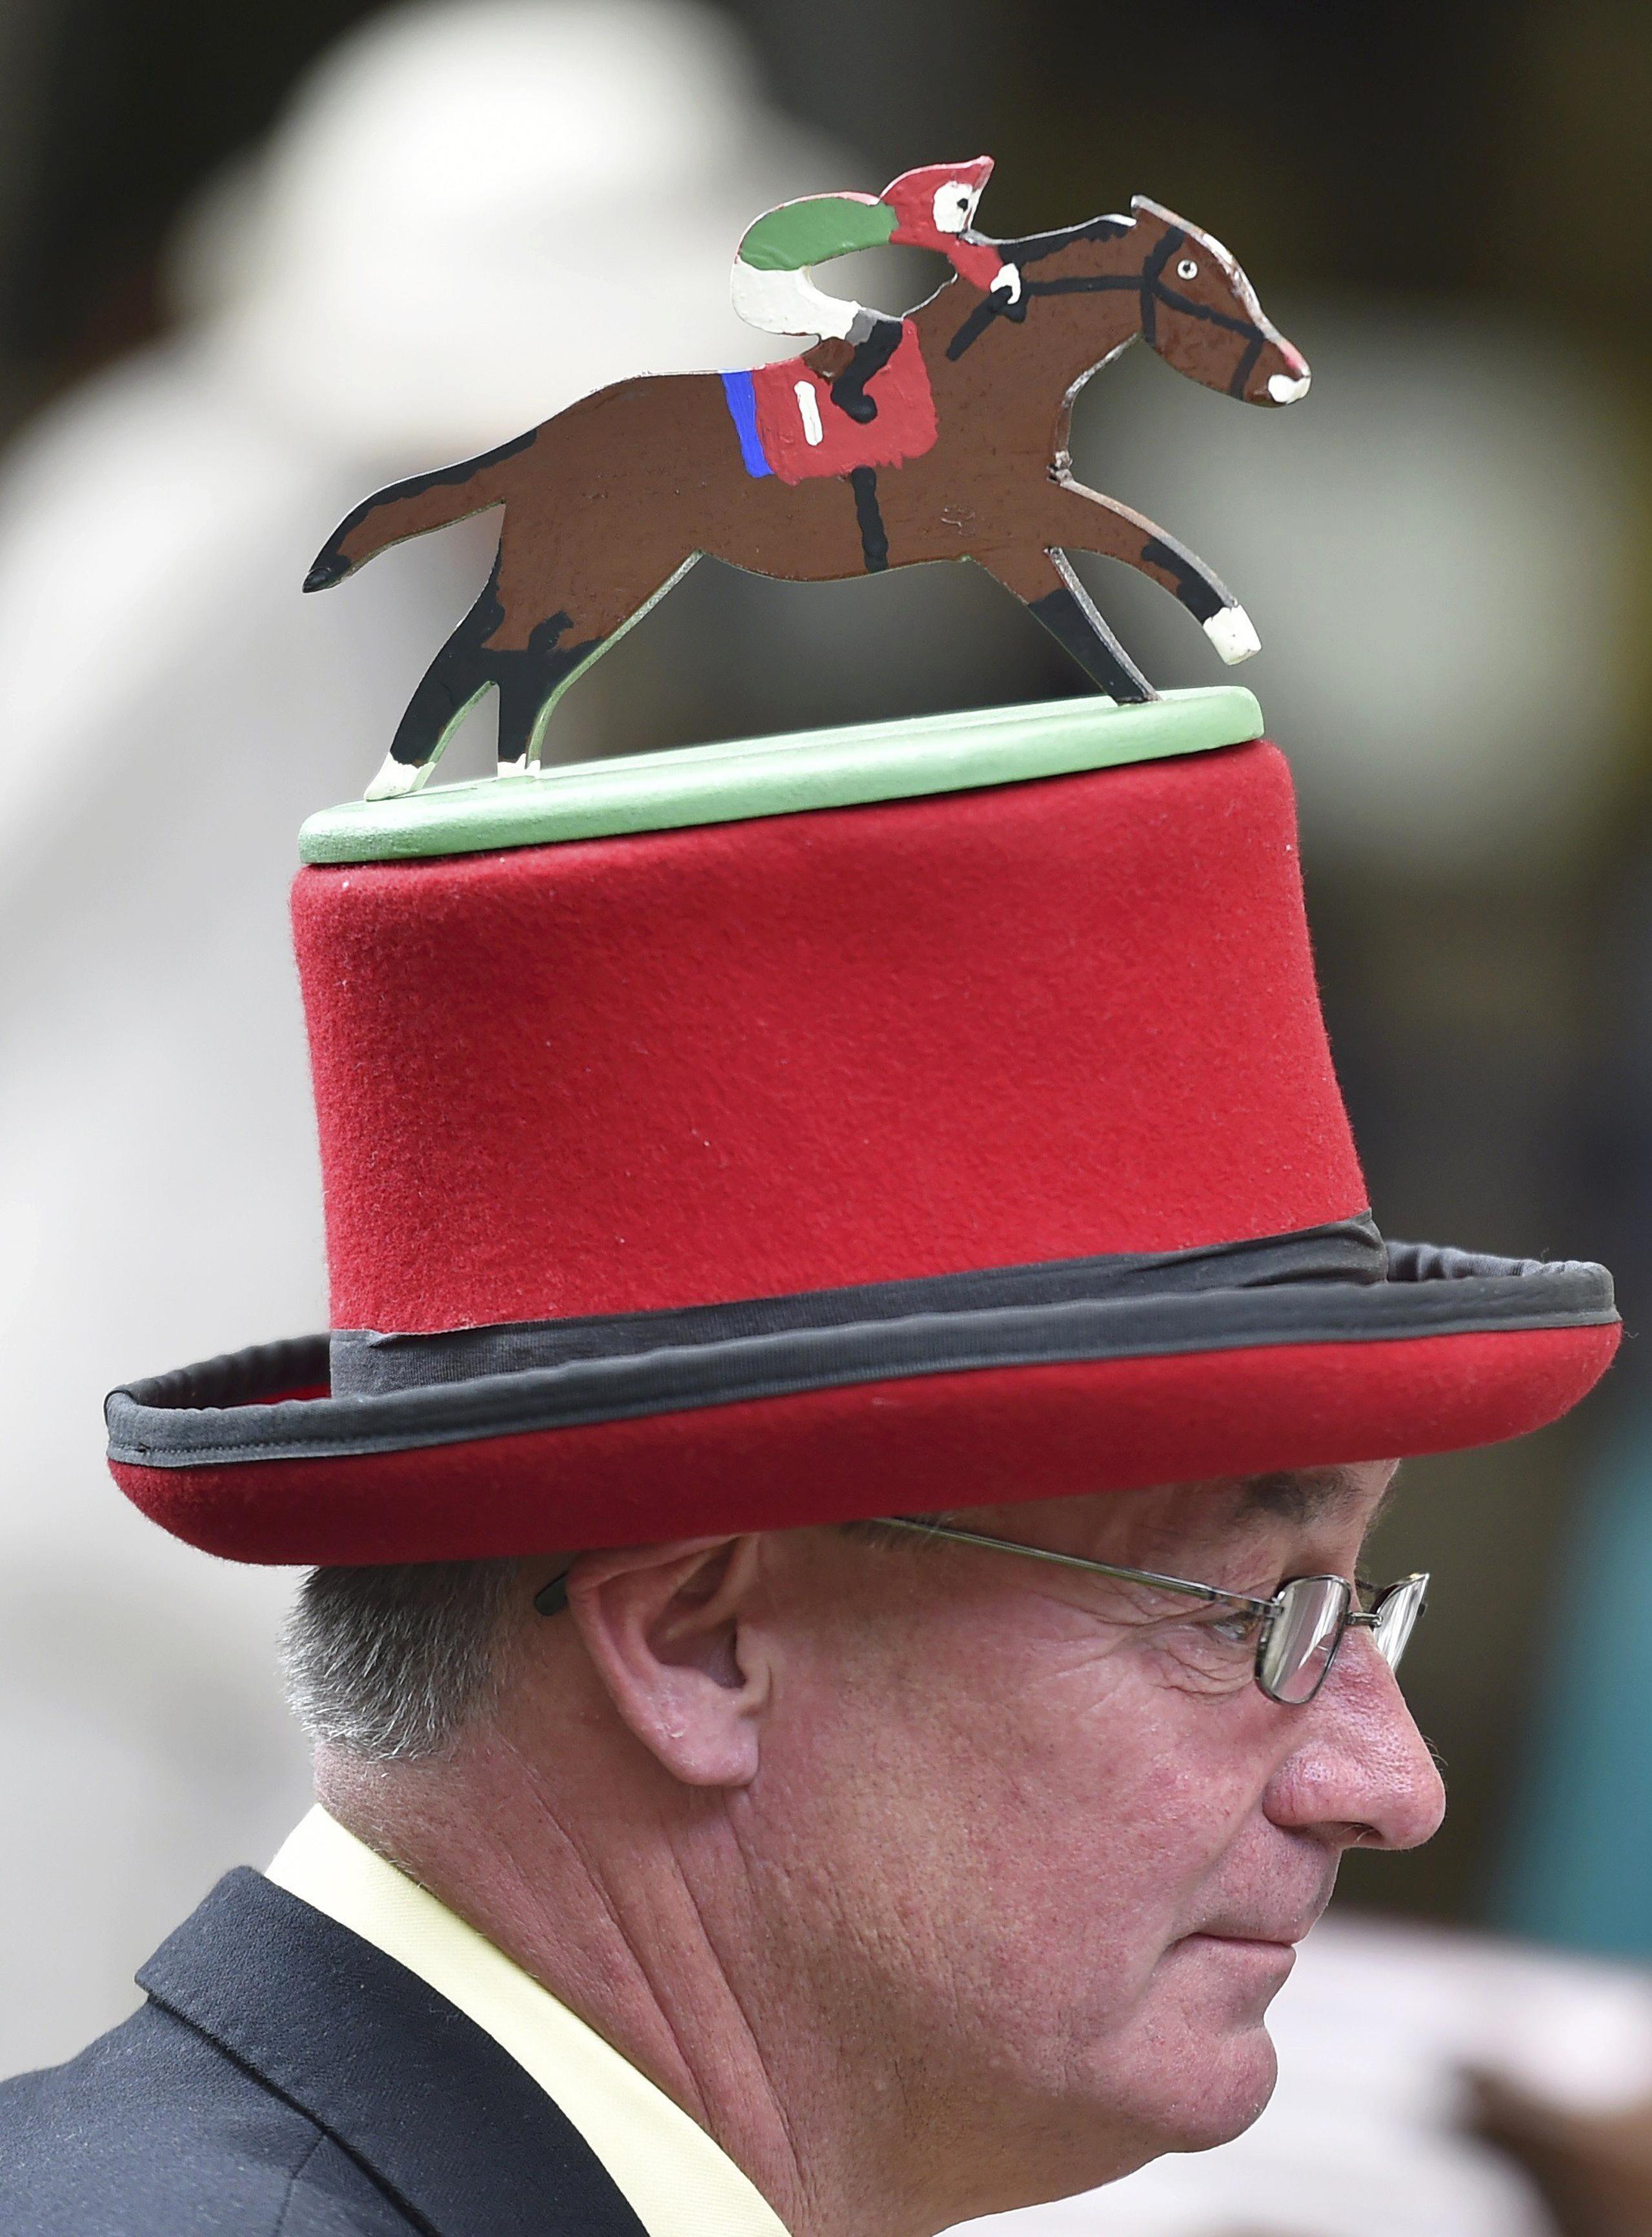 A racegoer's hat at the Royal Ascot horse race meeting in Ascot, U.K., on June 16, 2016.